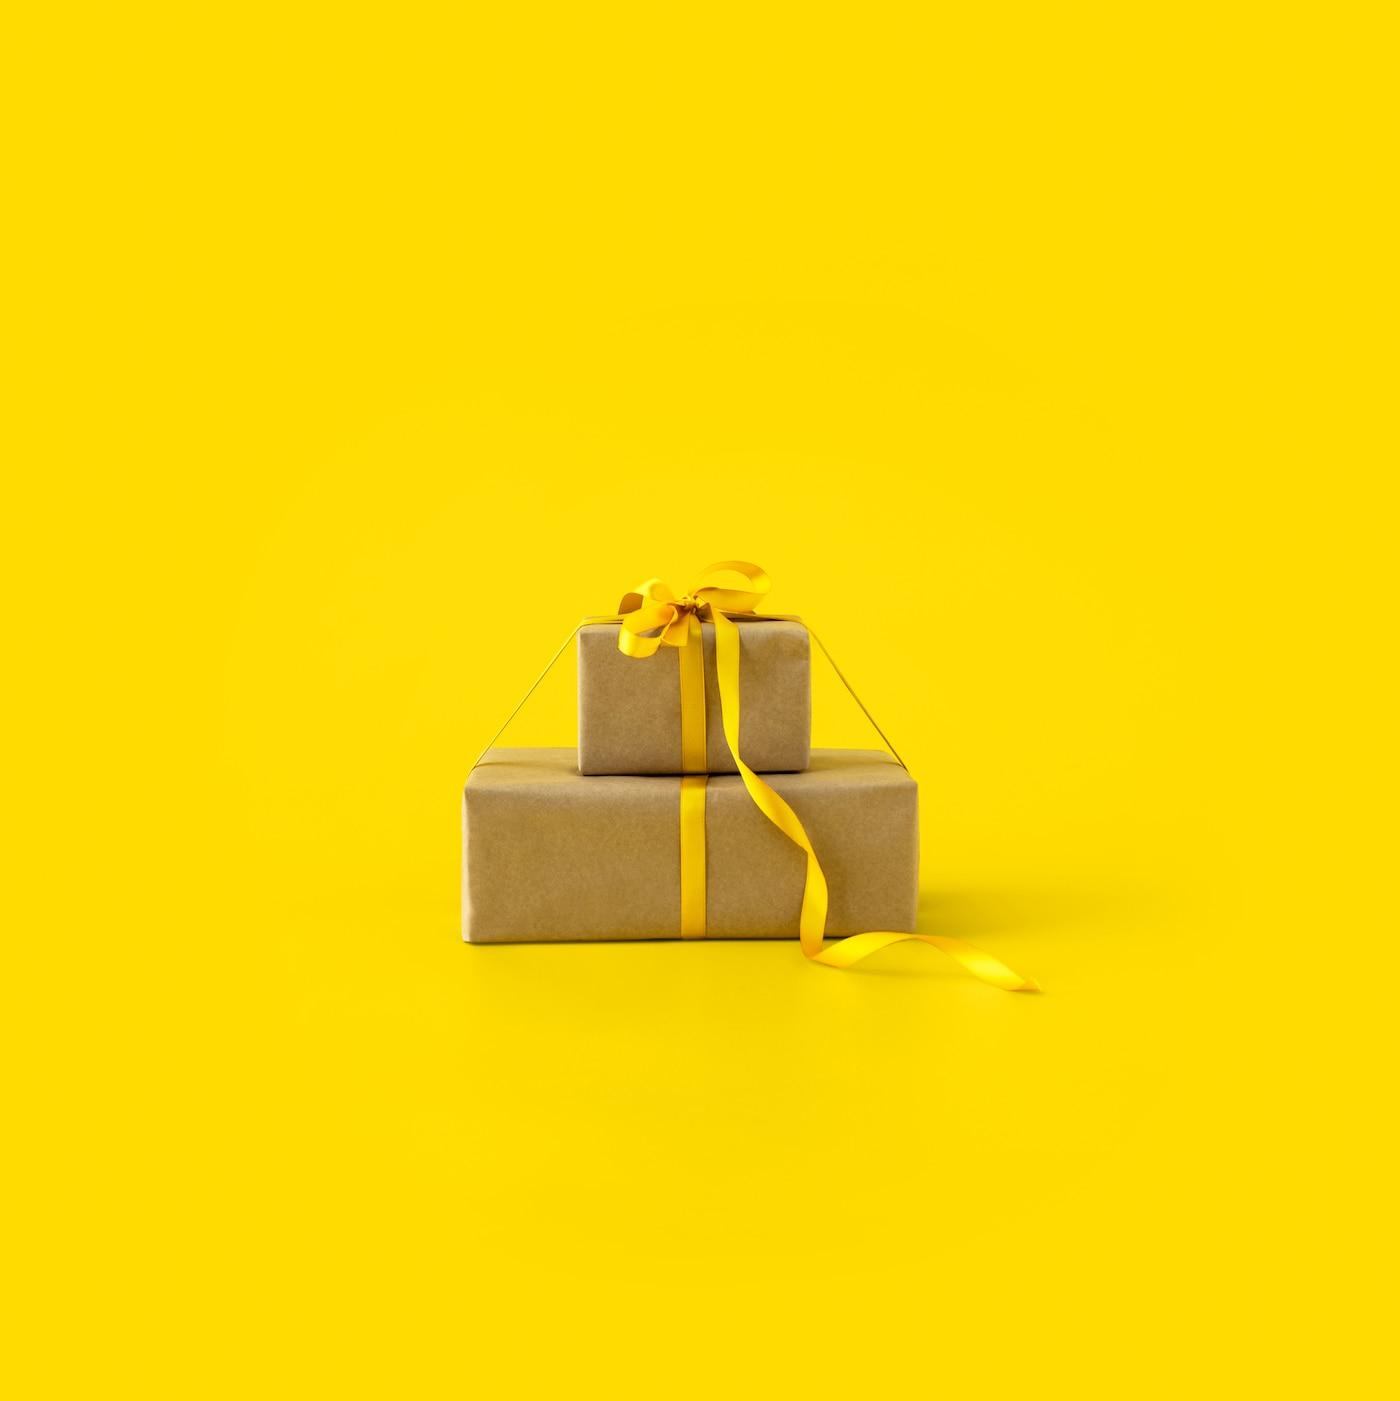 To gaver med gule bånd på en gul baggrund